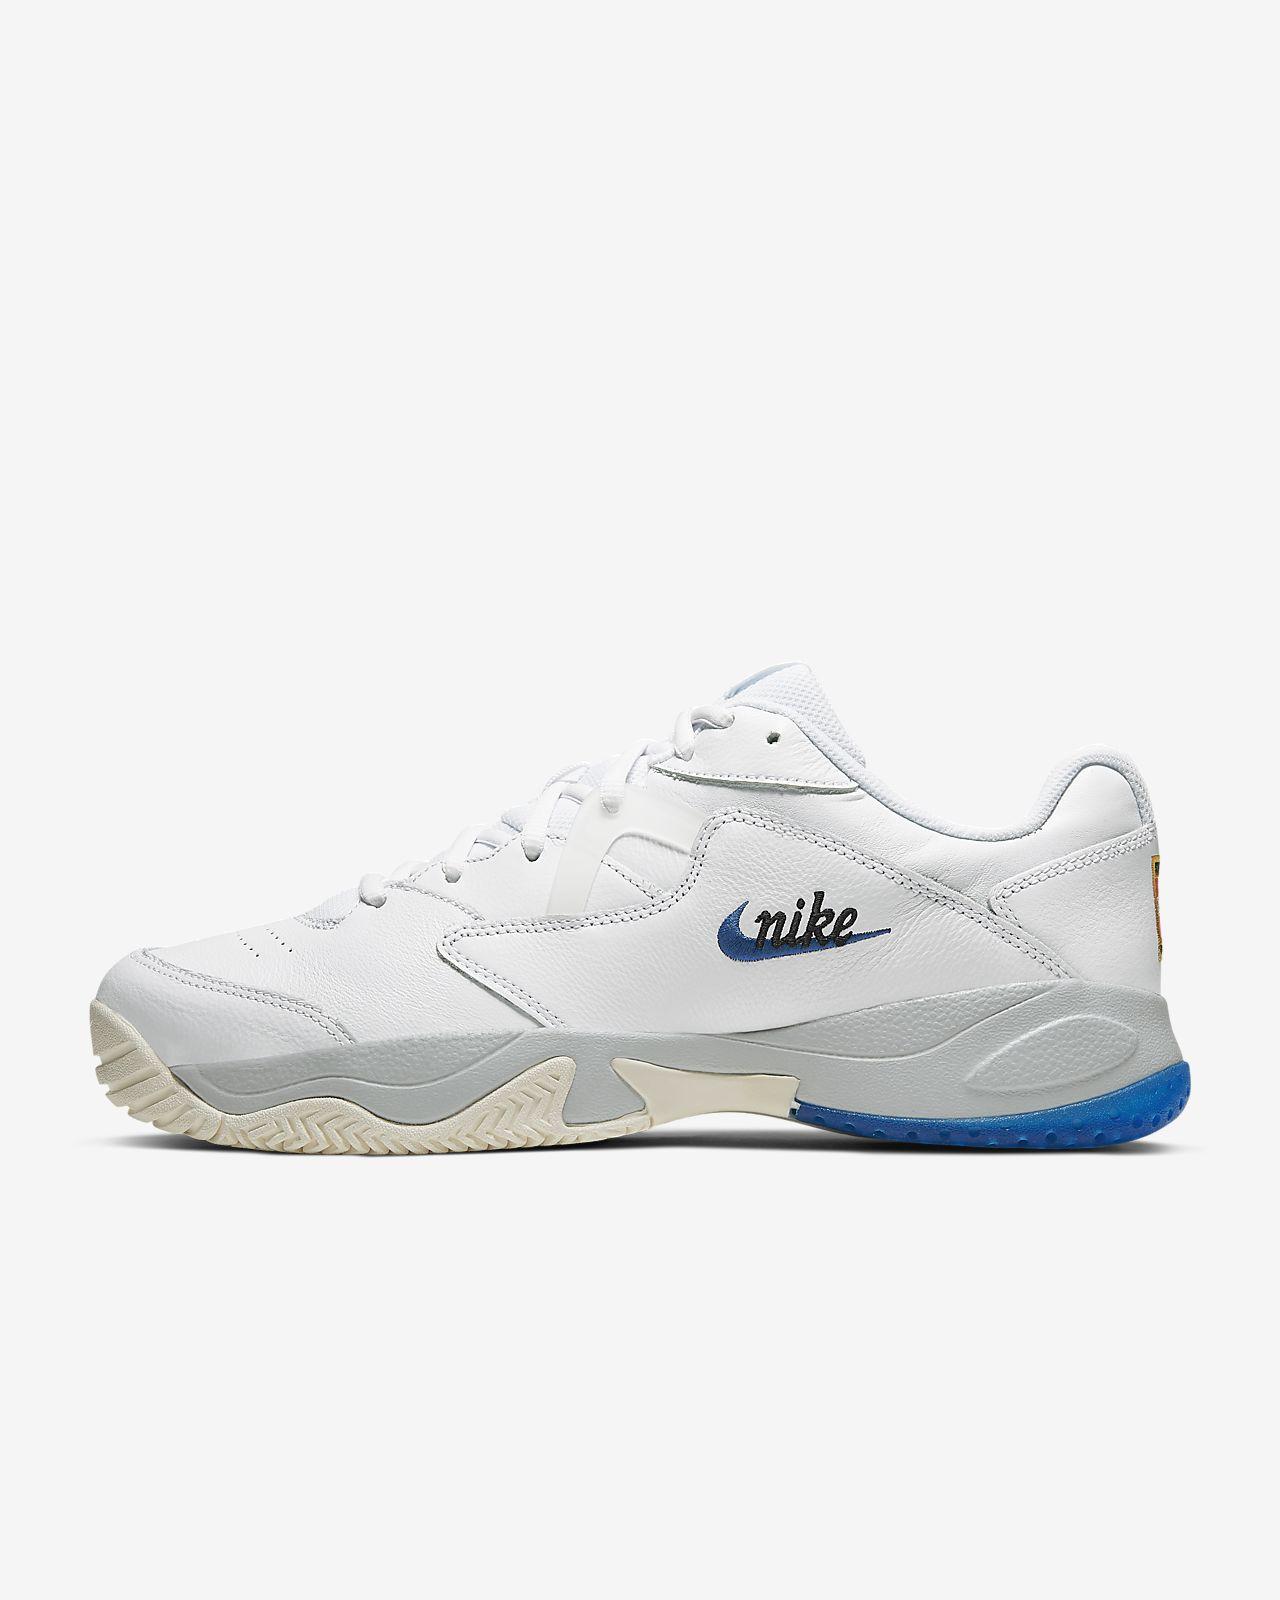 Men's Tennis Shoes. Nike GB